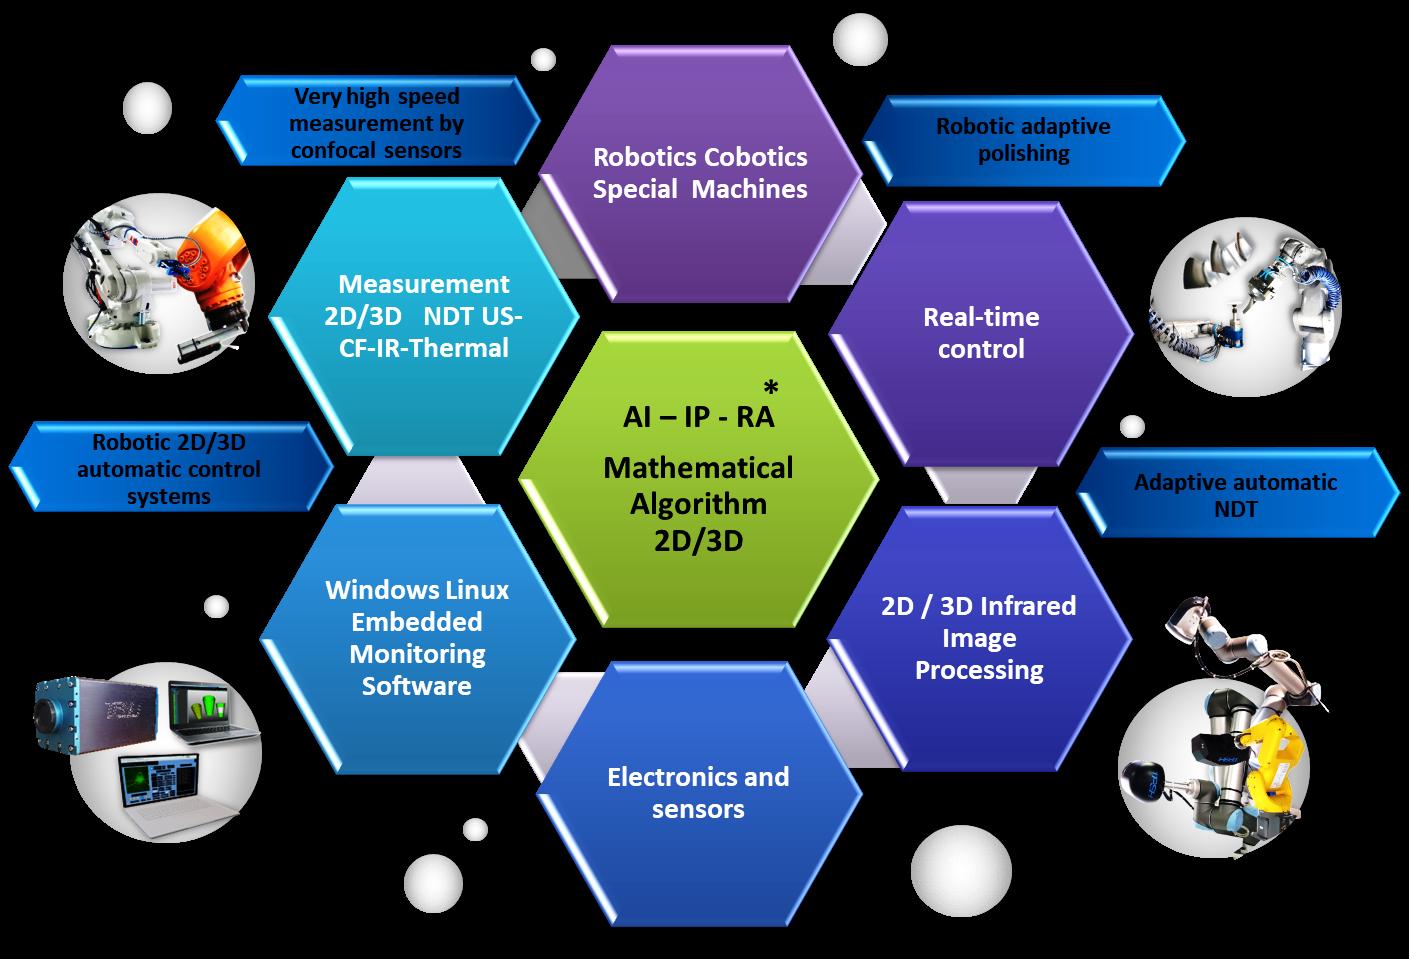 technological advances in 2D-3D automatic_robotized_cobotized control TPSH